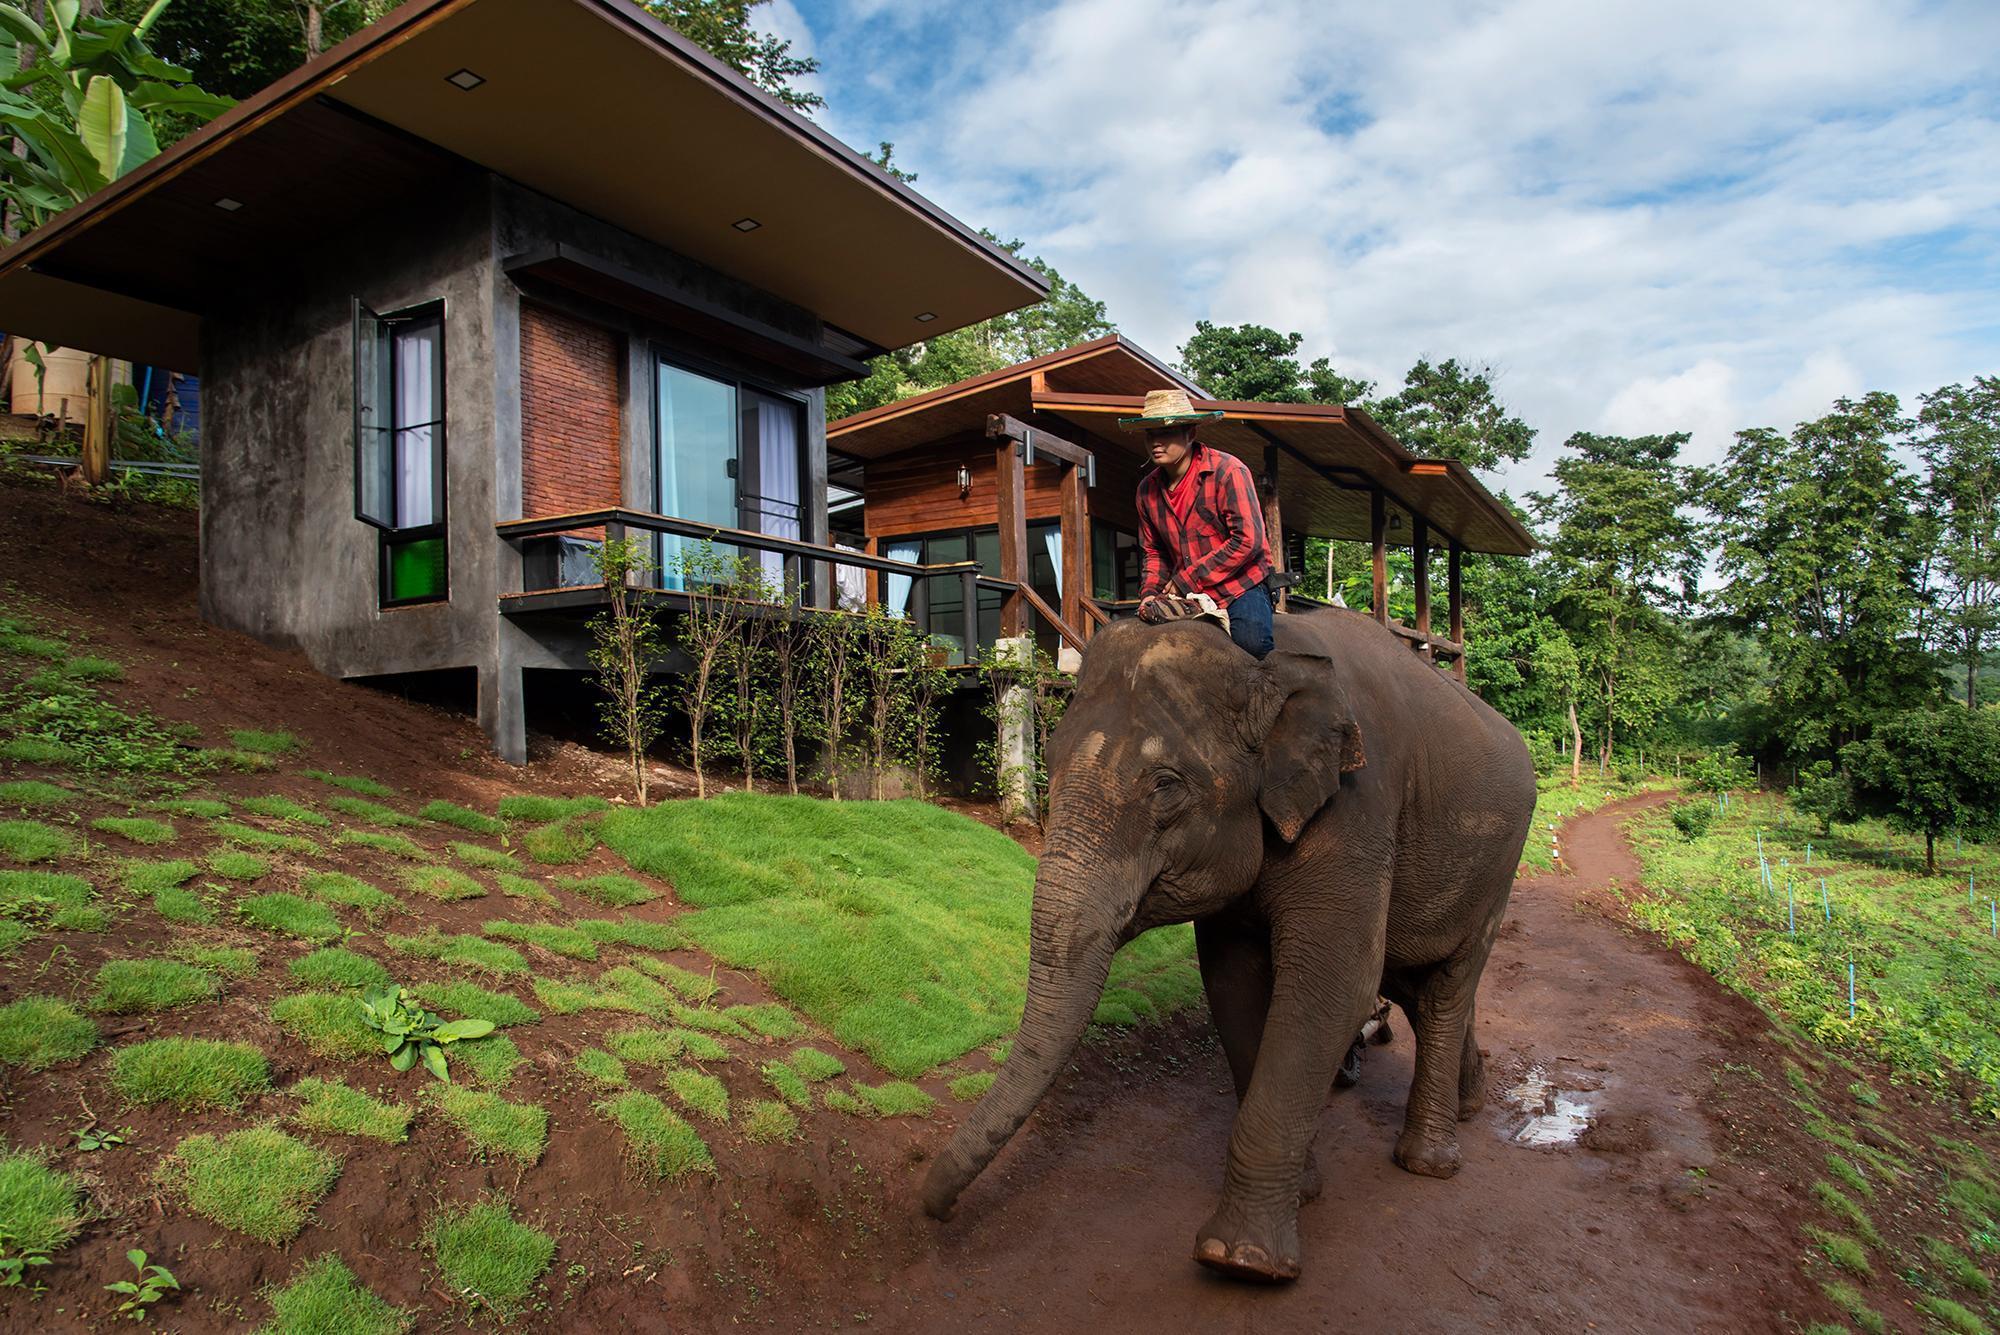 Chiang Mai Elephant Friends เชียงใหม่ เอลเลแฟนต์ เฟรนด์